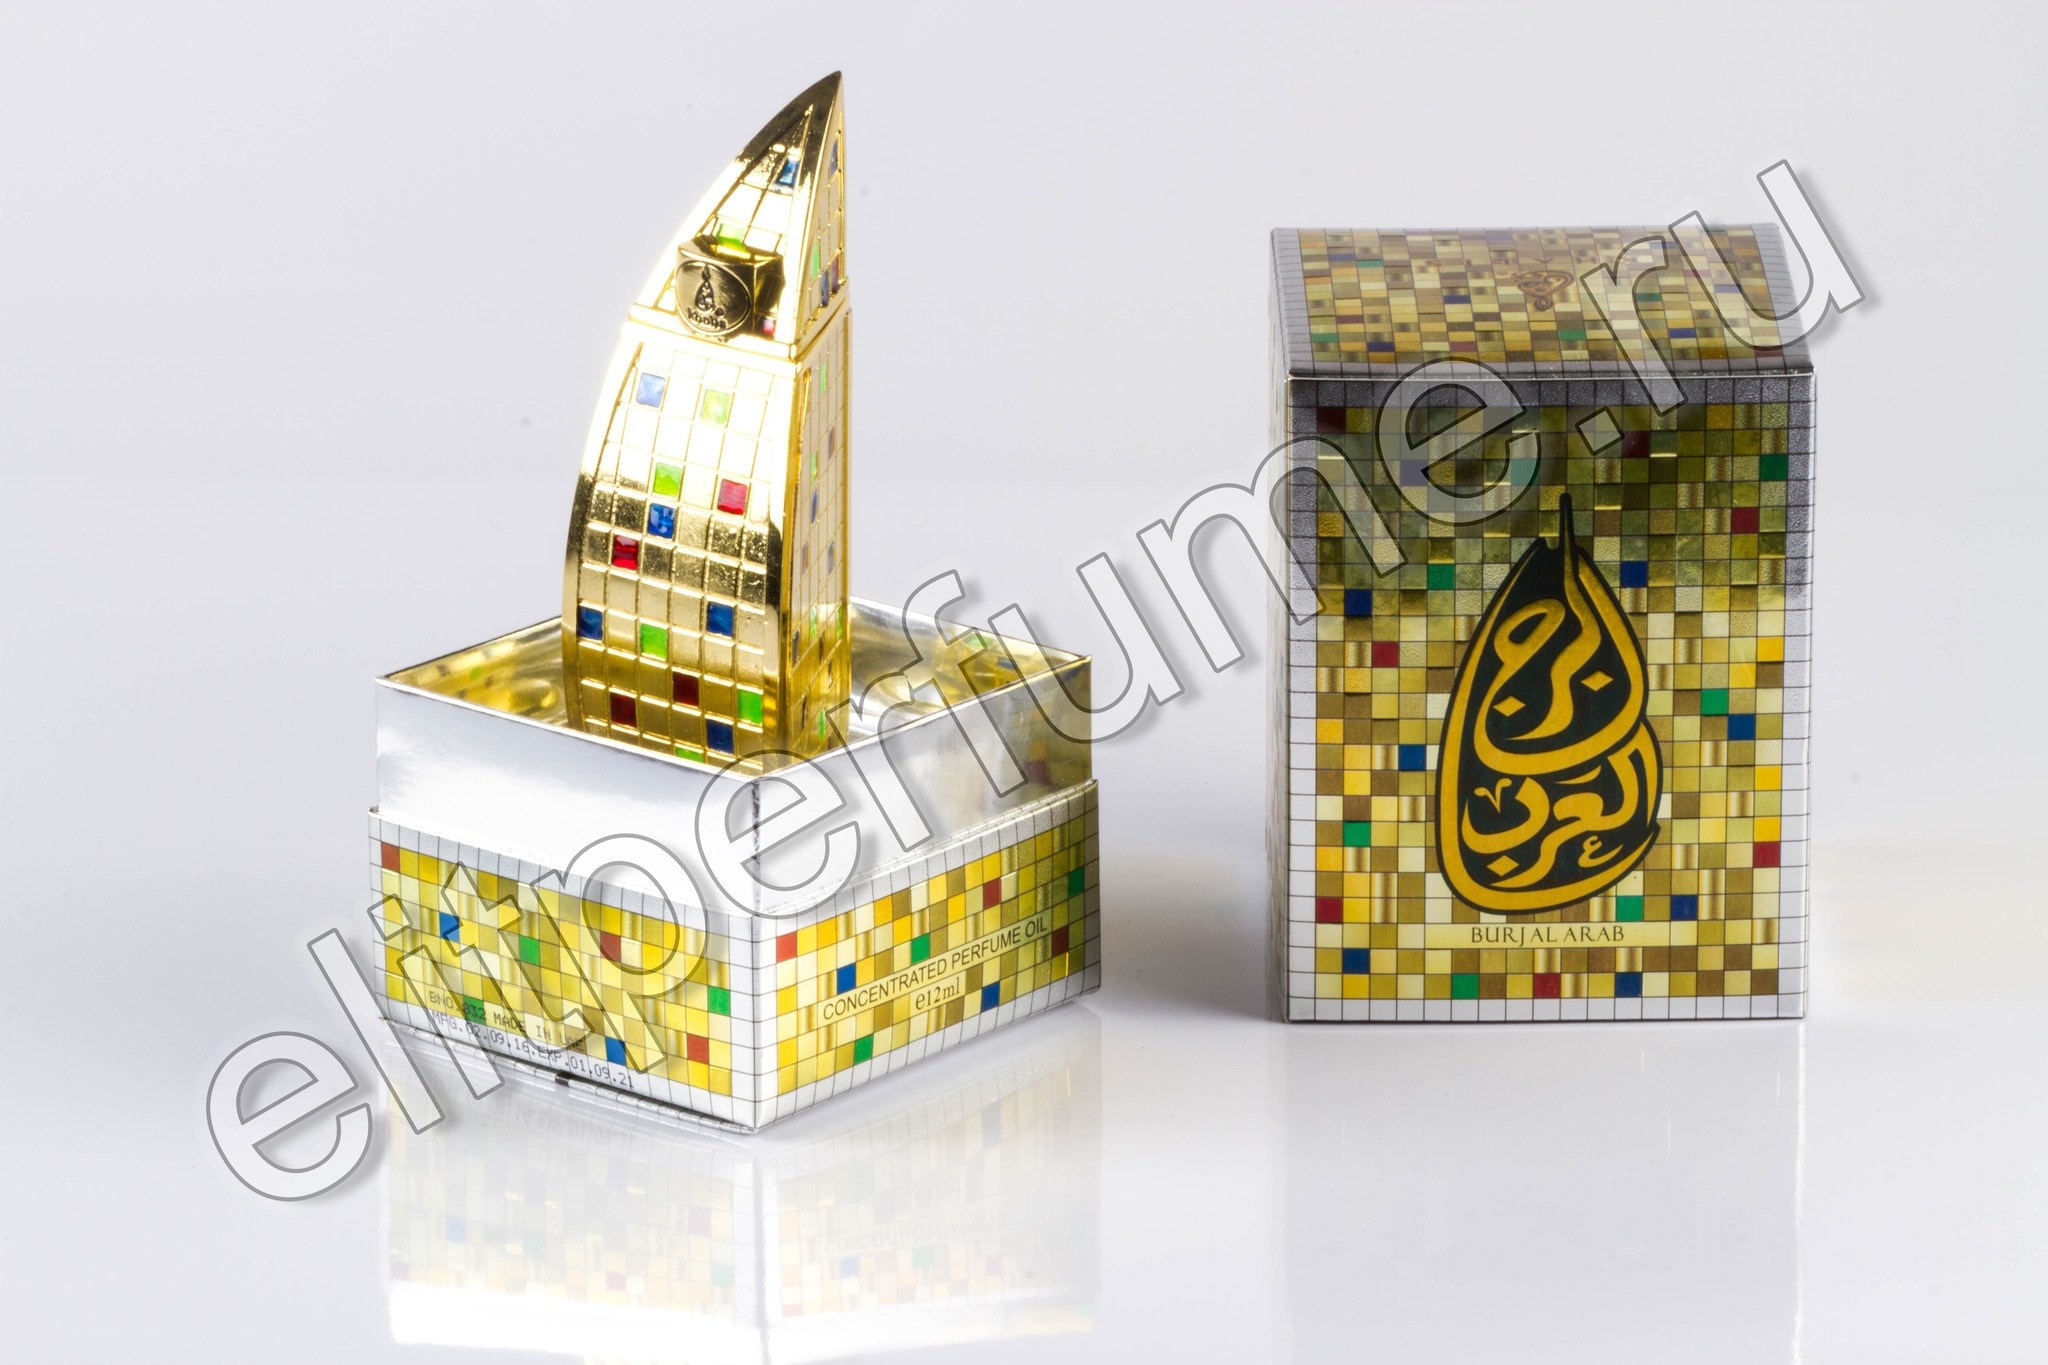 Burj Al Arab Бурж Аль Араб 12 мл Унисекс арабские масляные духи от Халис Khalis Perfumes